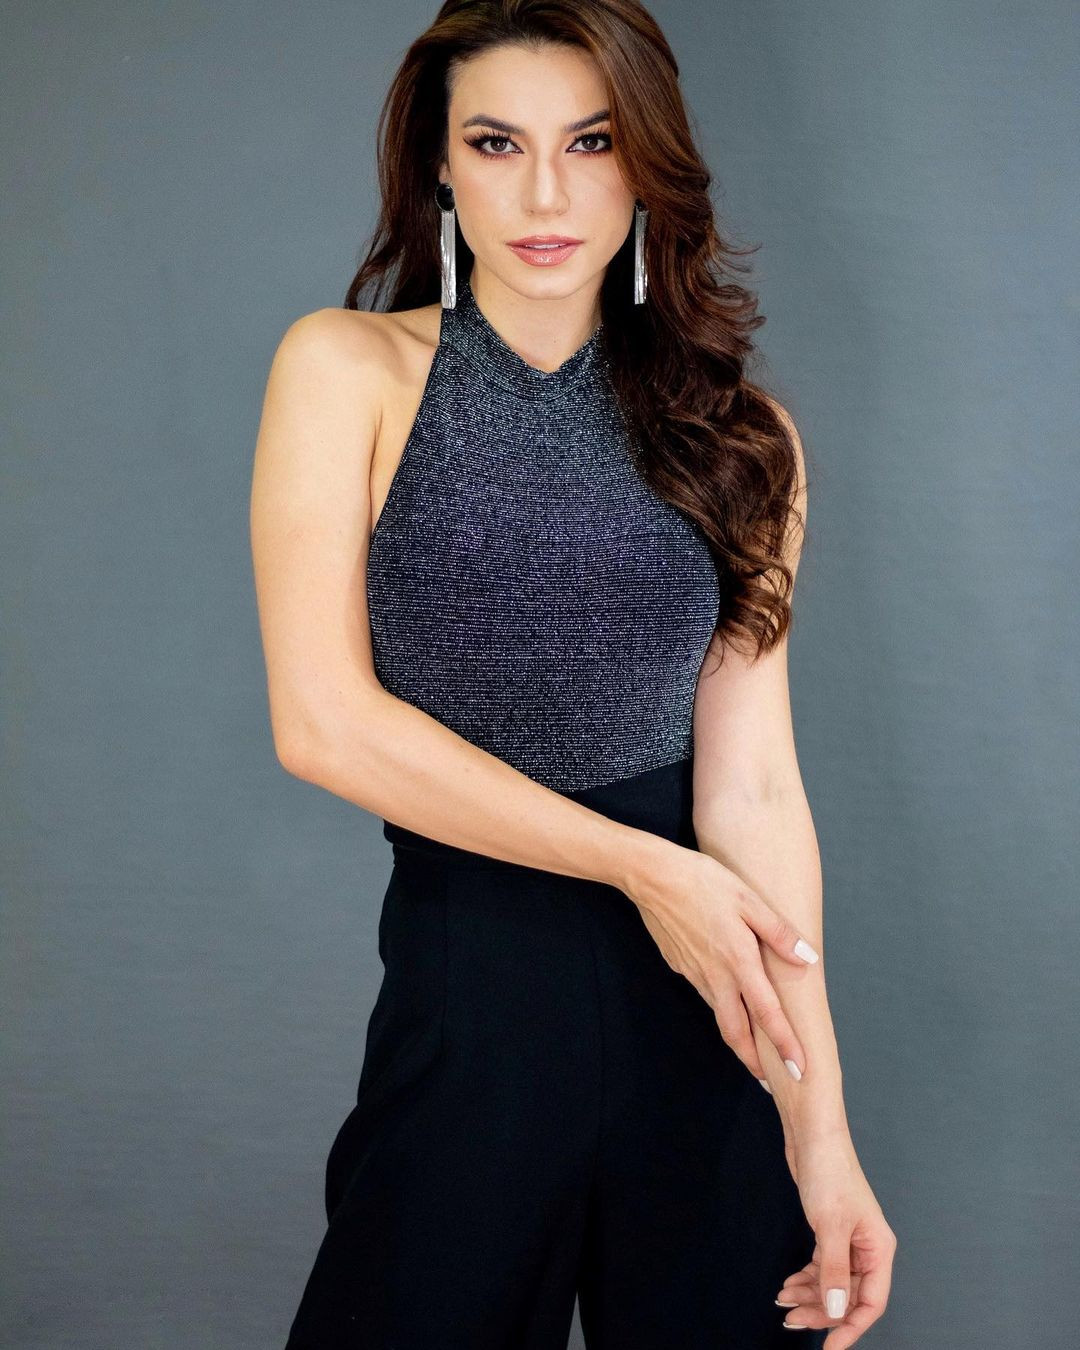 julia gama, miss brasil universo 2020/top 11 de miss world 2014. part II. - Página 29 Bo67lp10